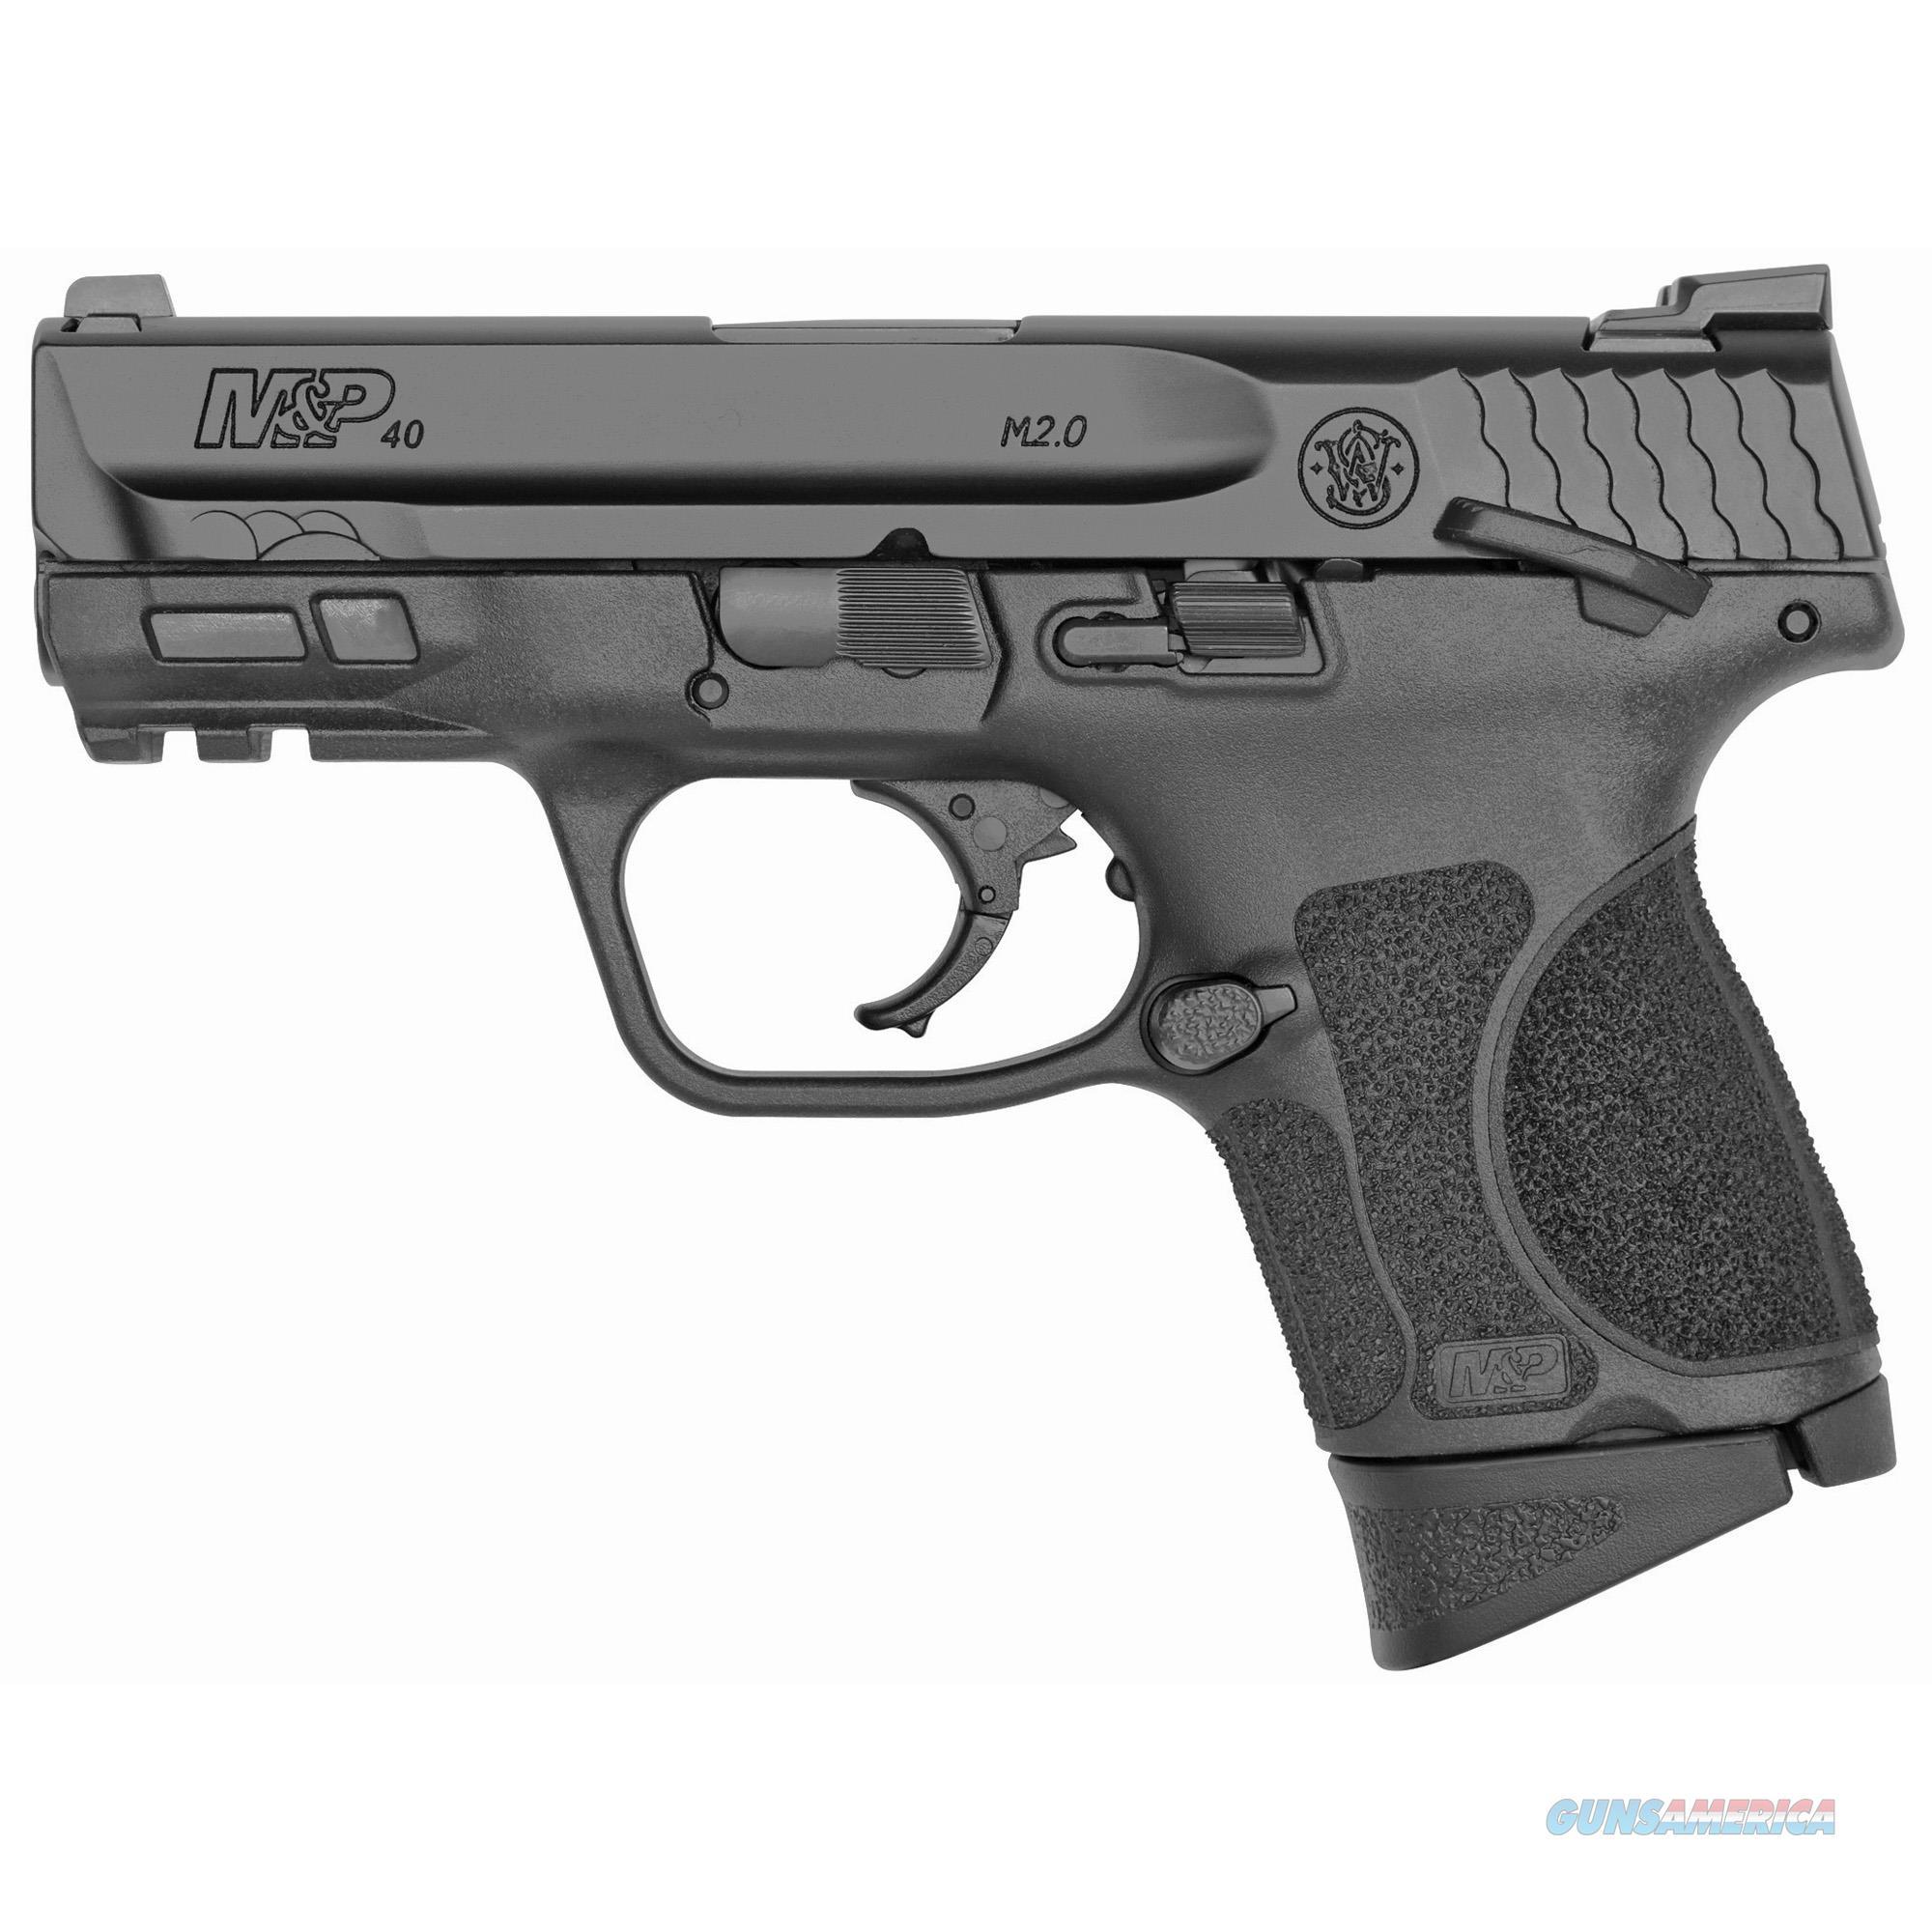 Smith & Wesson M&p 40, S&w M&p40c    12484   40 3.6  2.0  Ts         10r  Guns > Pistols > 1911 Pistol Copies (non-Colt)